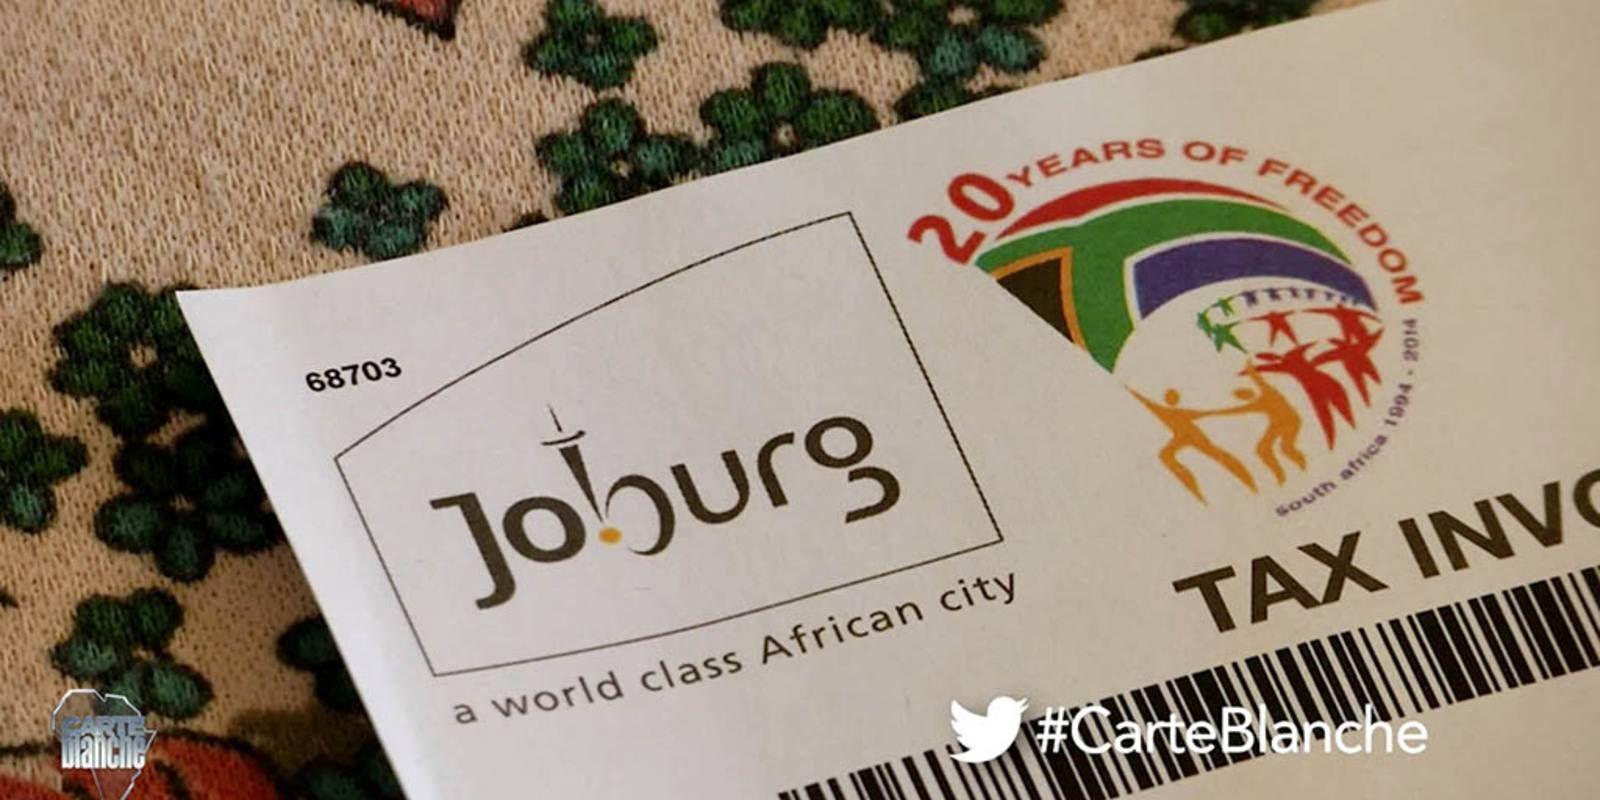 1529535957 34 joburg 2 logo